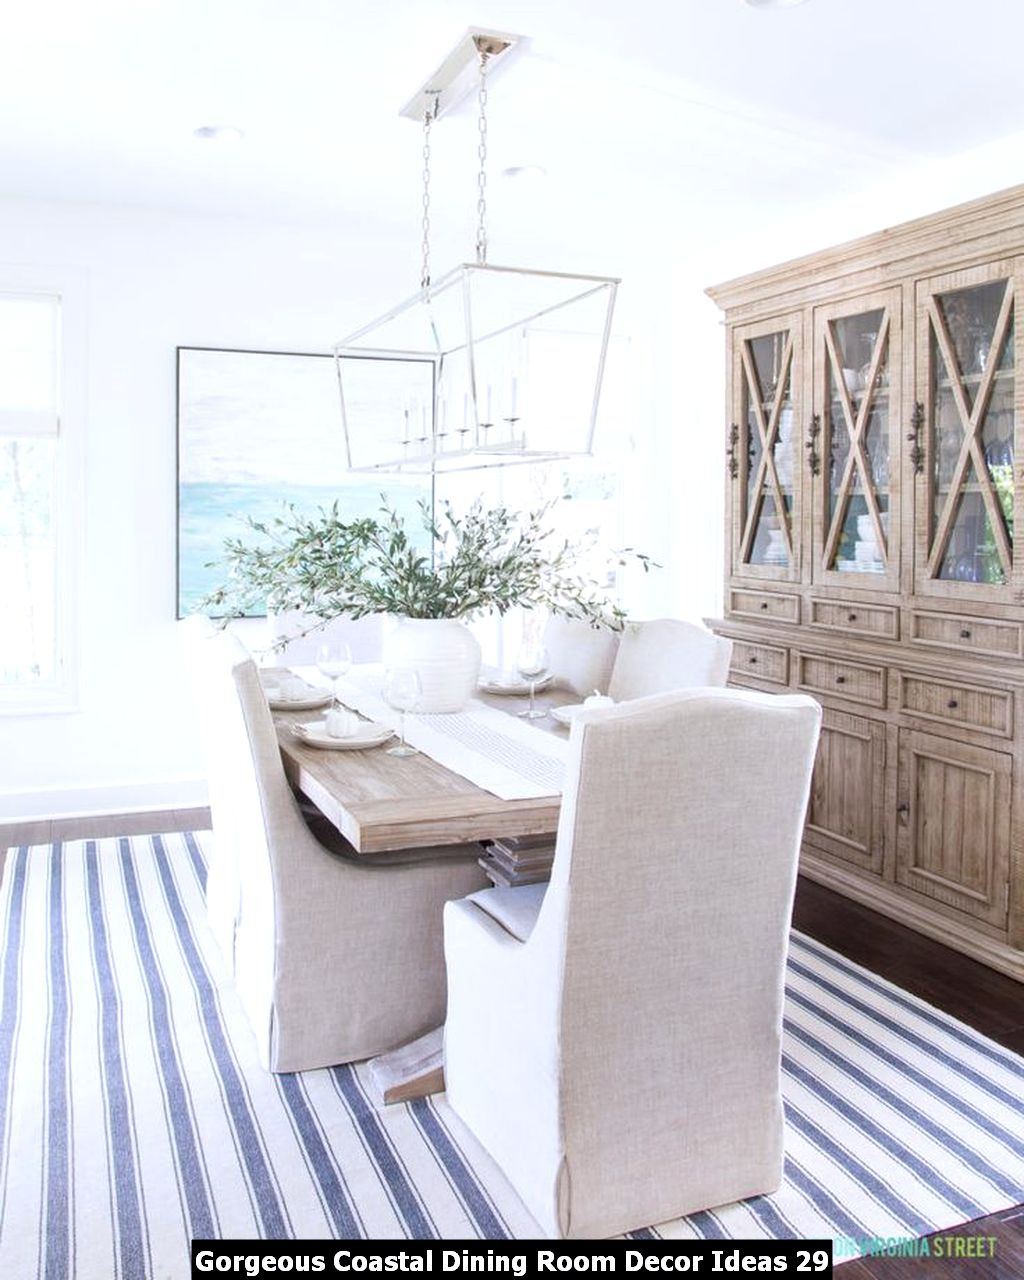 Gorgeous Coastal Dining Room Decor Ideas 29